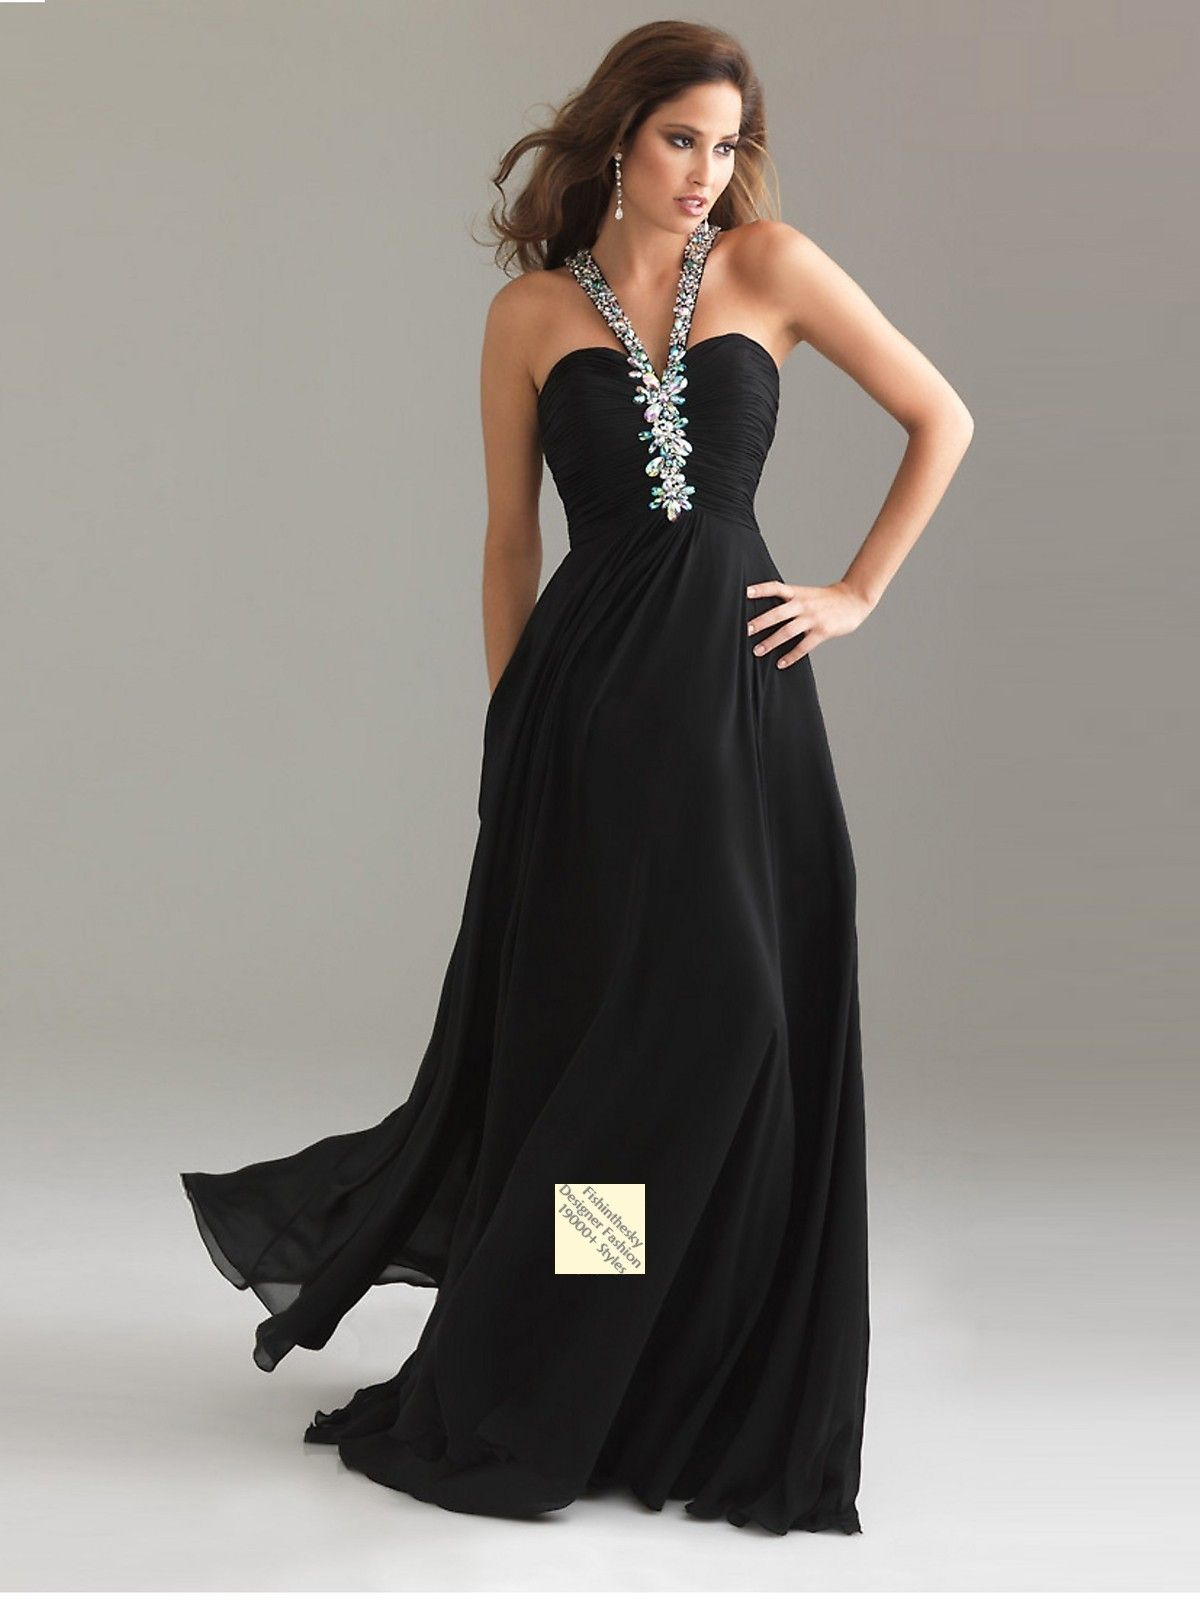 Bridesmaid dress dresses pinterest prom uk prom dresses and